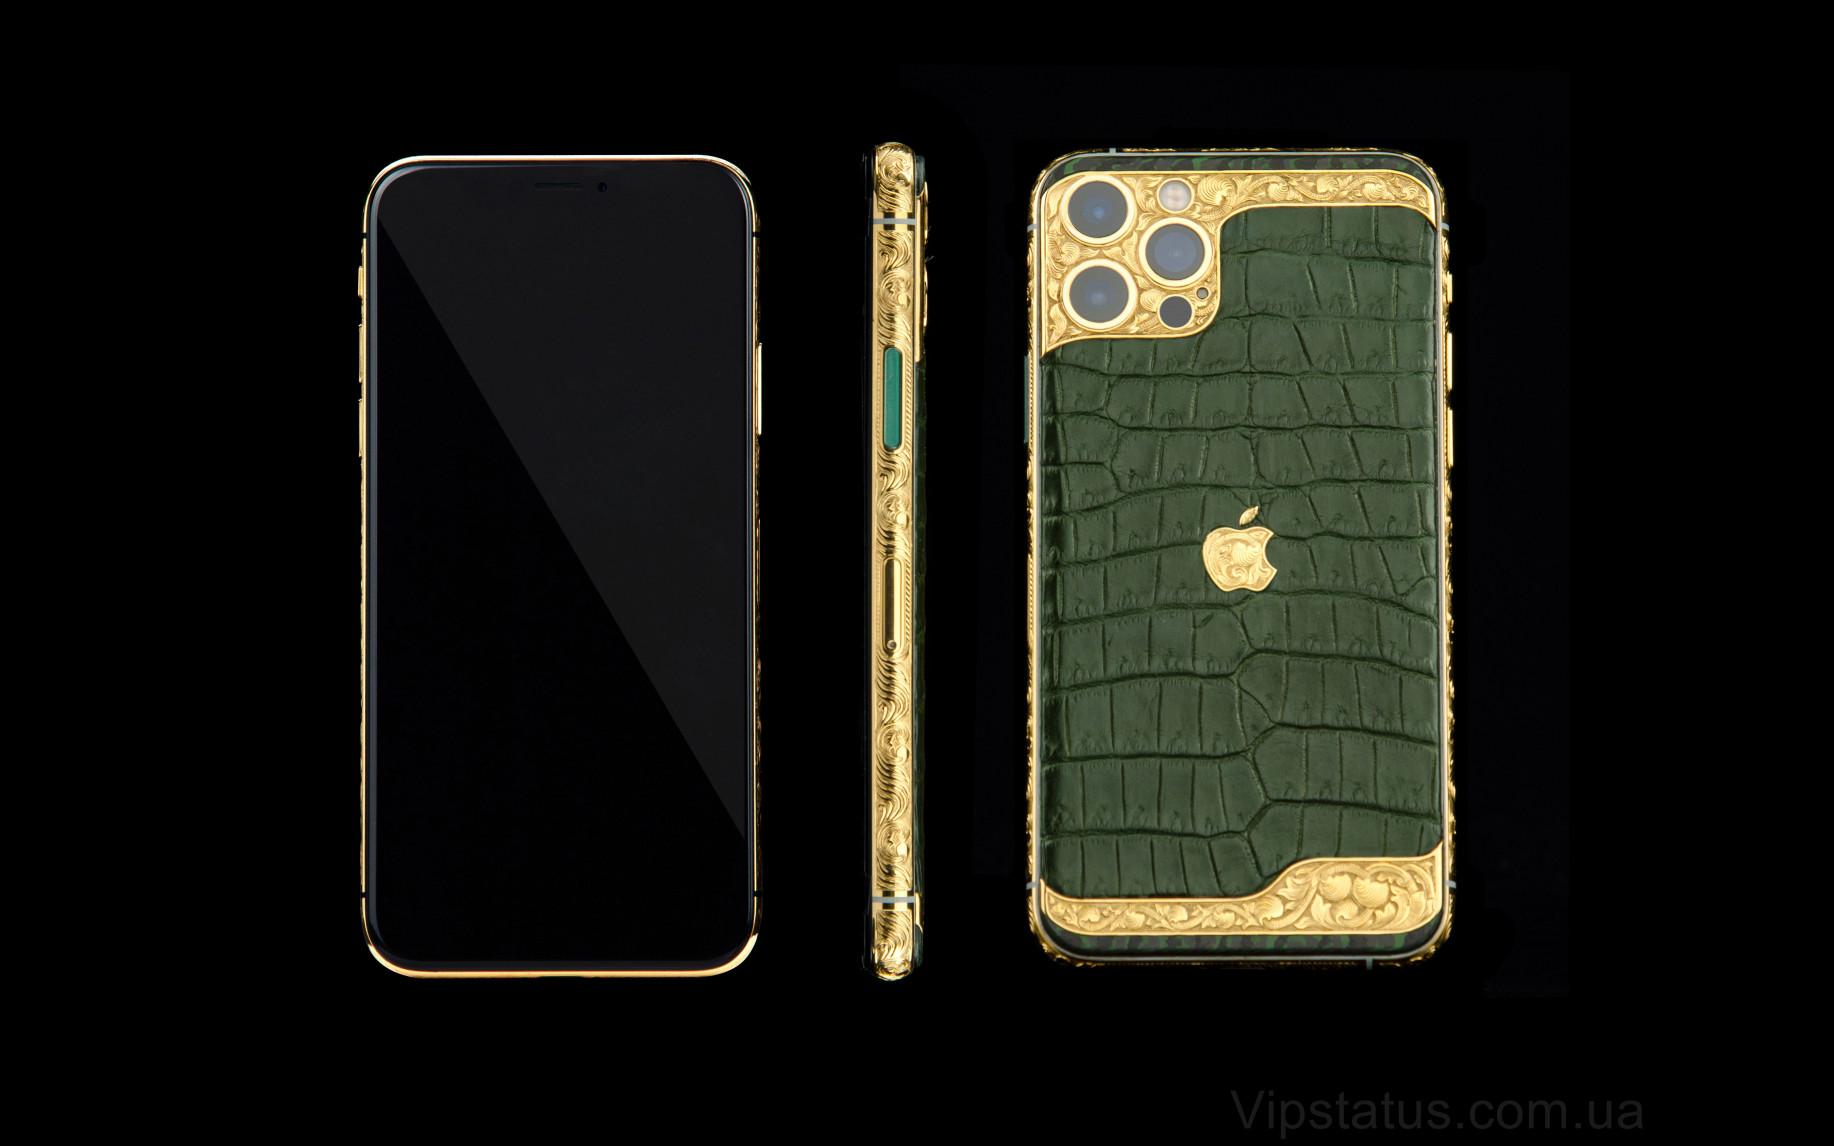 Elite Eastern Emerald IPHONE 12 PRO MAX 512 GB Eastern Emerald IPHONE 12 PRO MAX 512 GB image 4